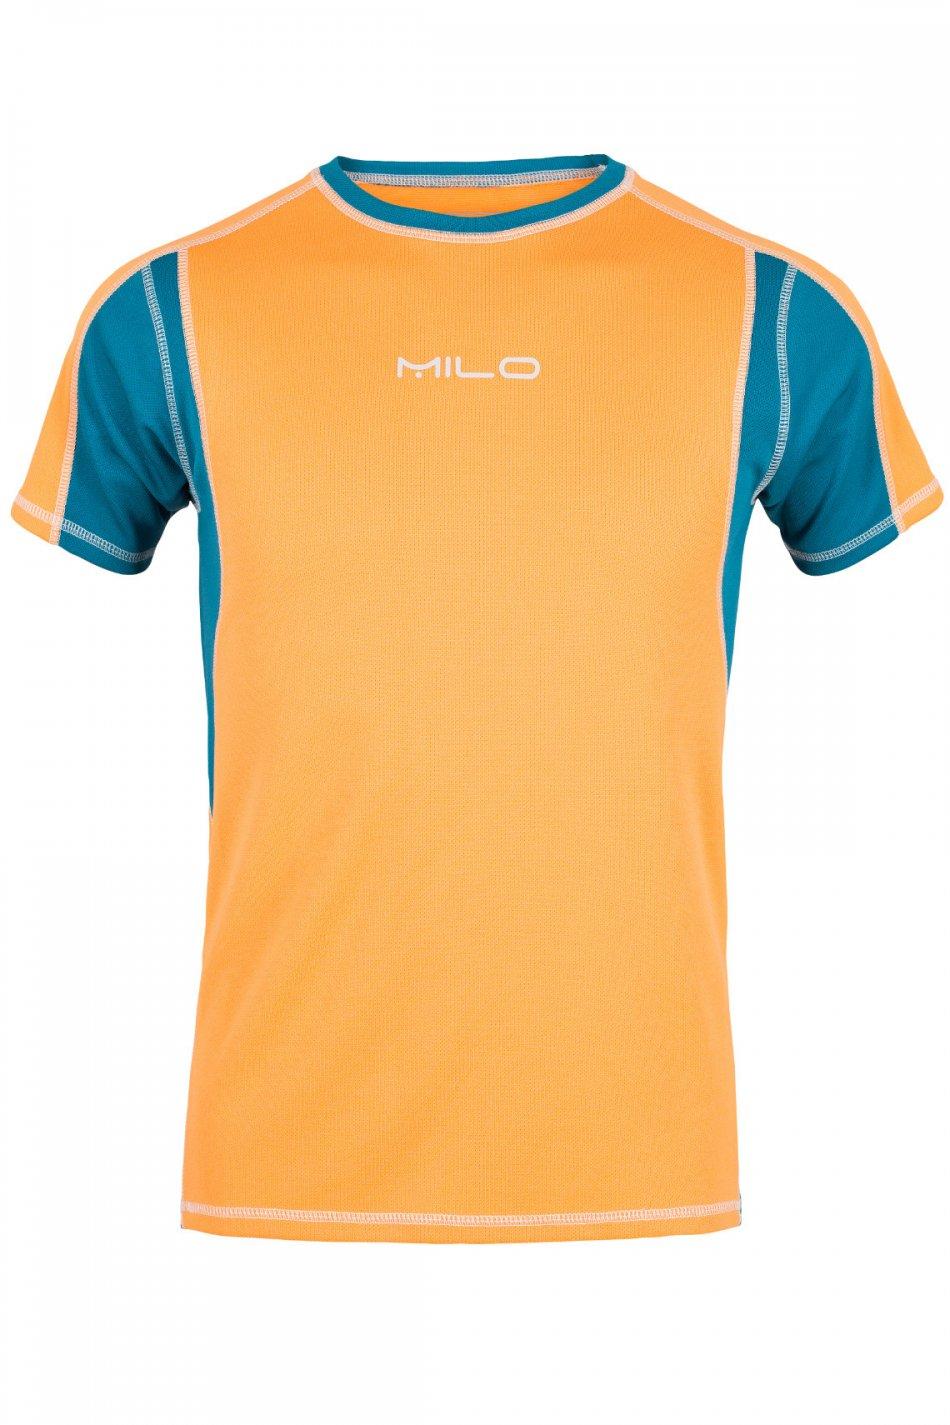 Milo Tolga Orange Turquoise